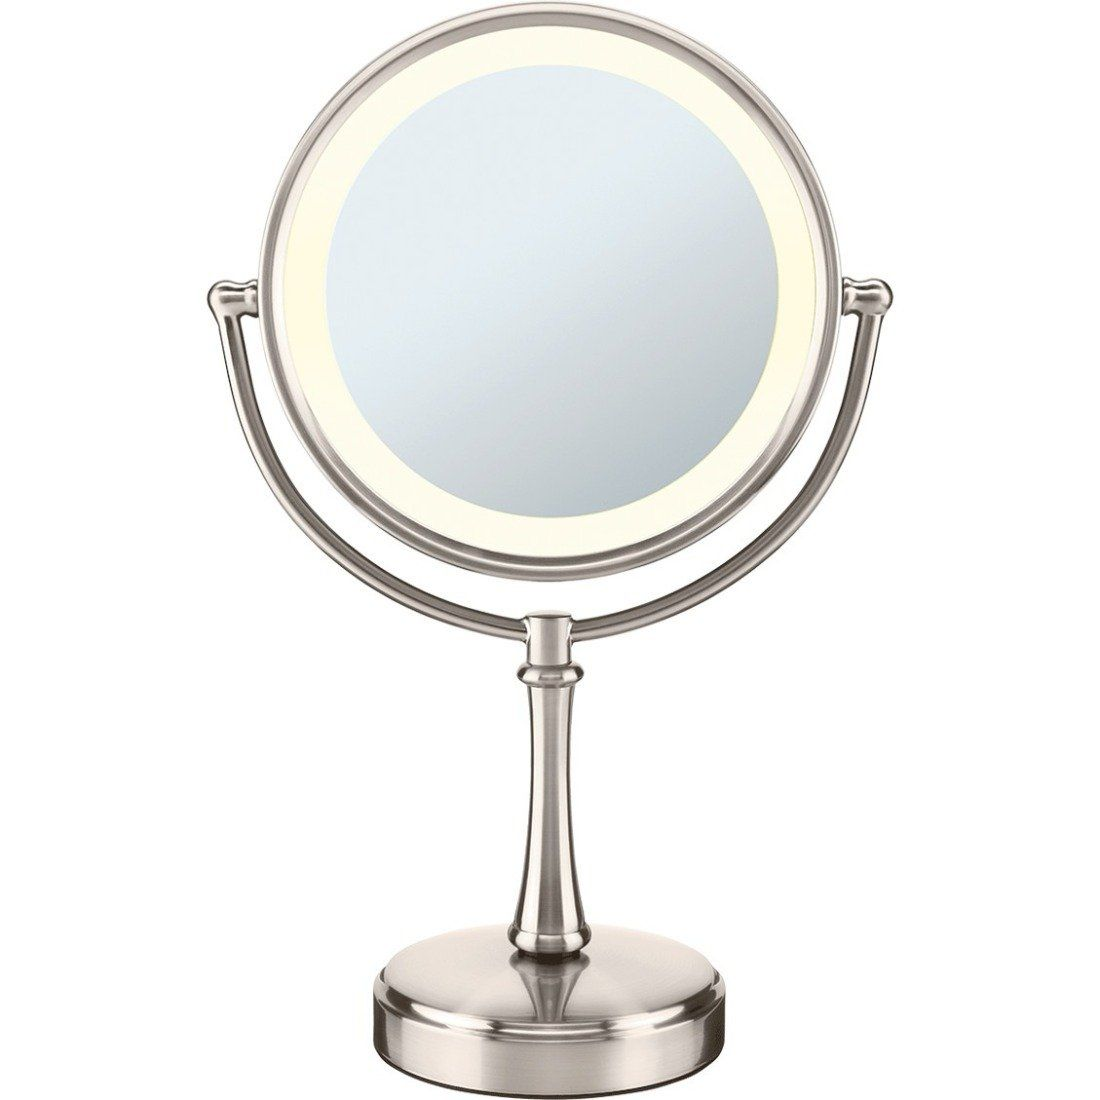 Conair Be87tsn Magnifying Mirror Makeup Mirror With Lights